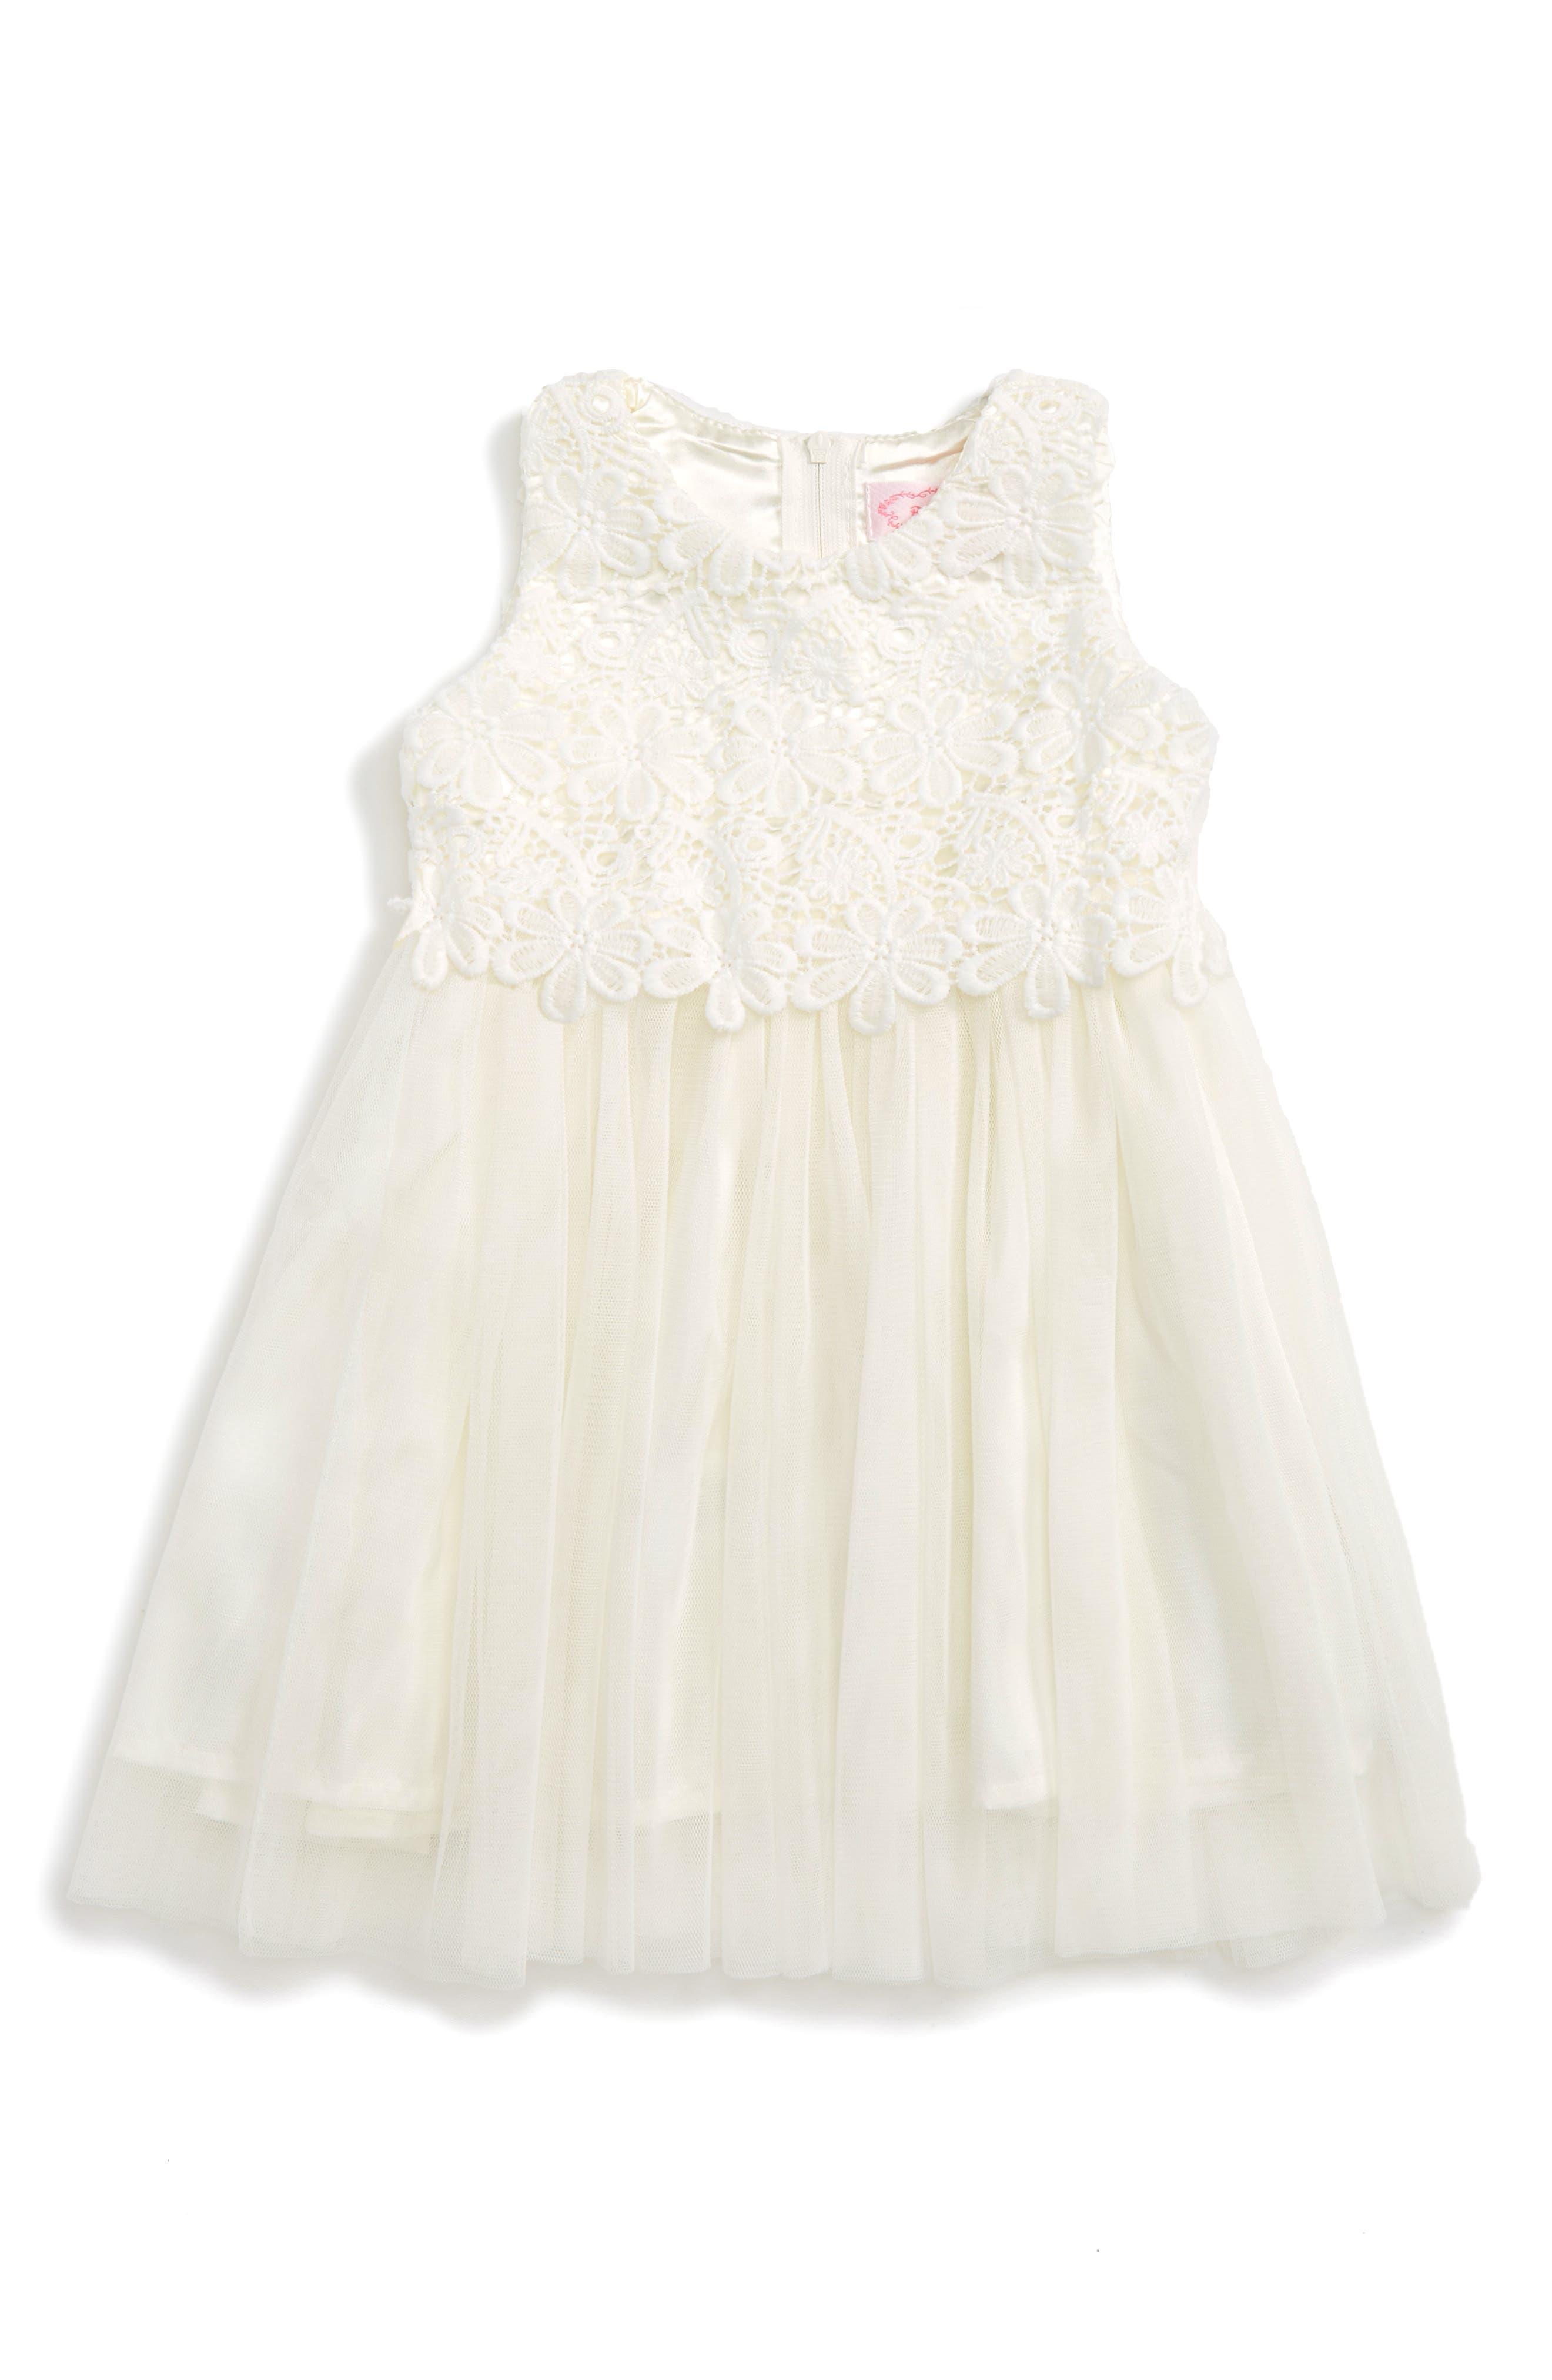 Lace & Tulle Dress,                             Main thumbnail 1, color,                             White